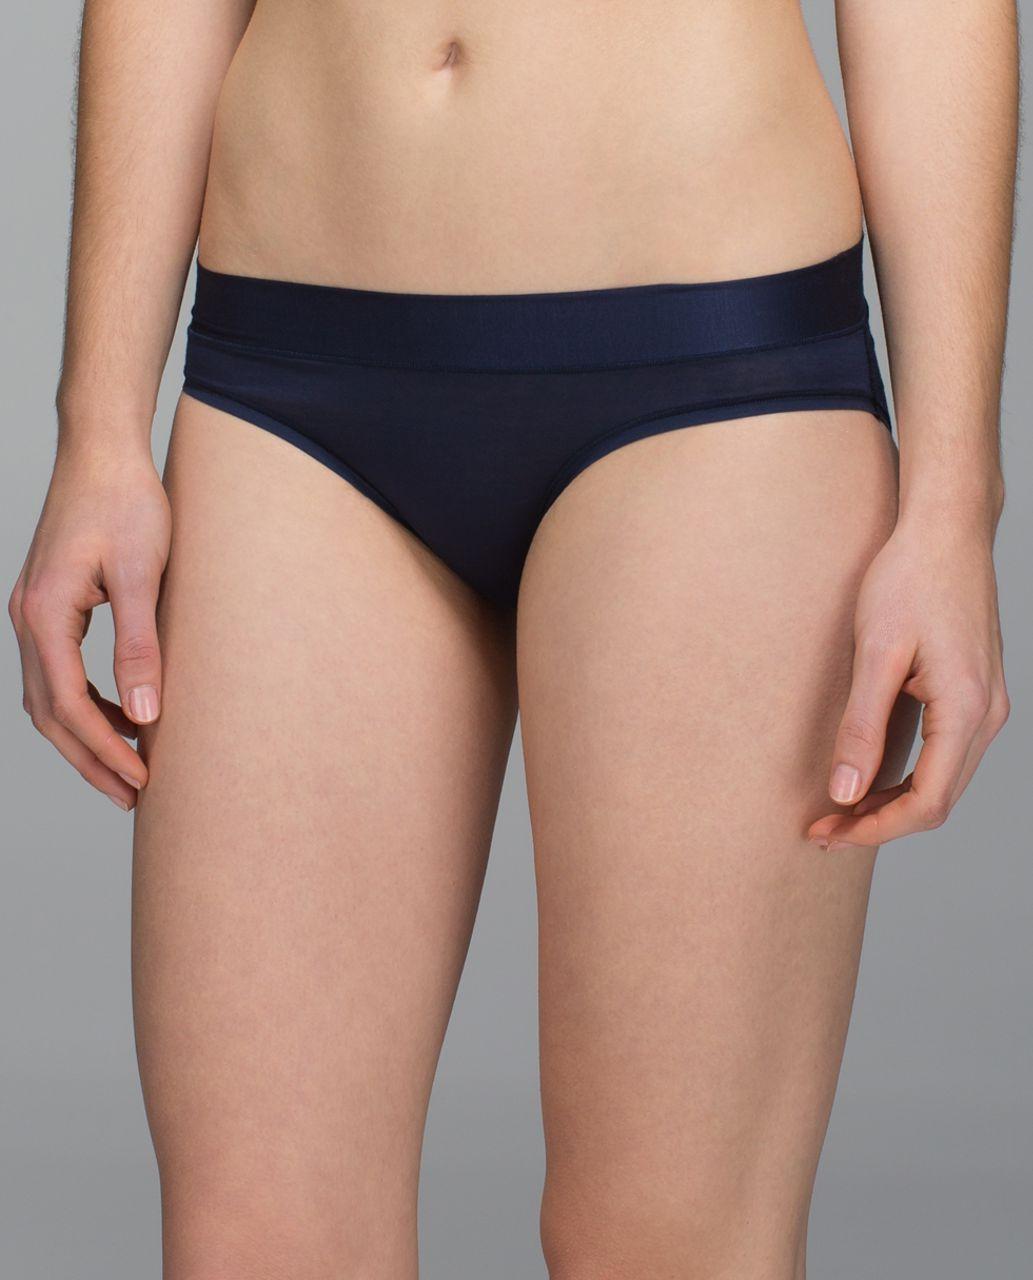 Lululemon Mula Bandhawear Bikini - Deep Navy